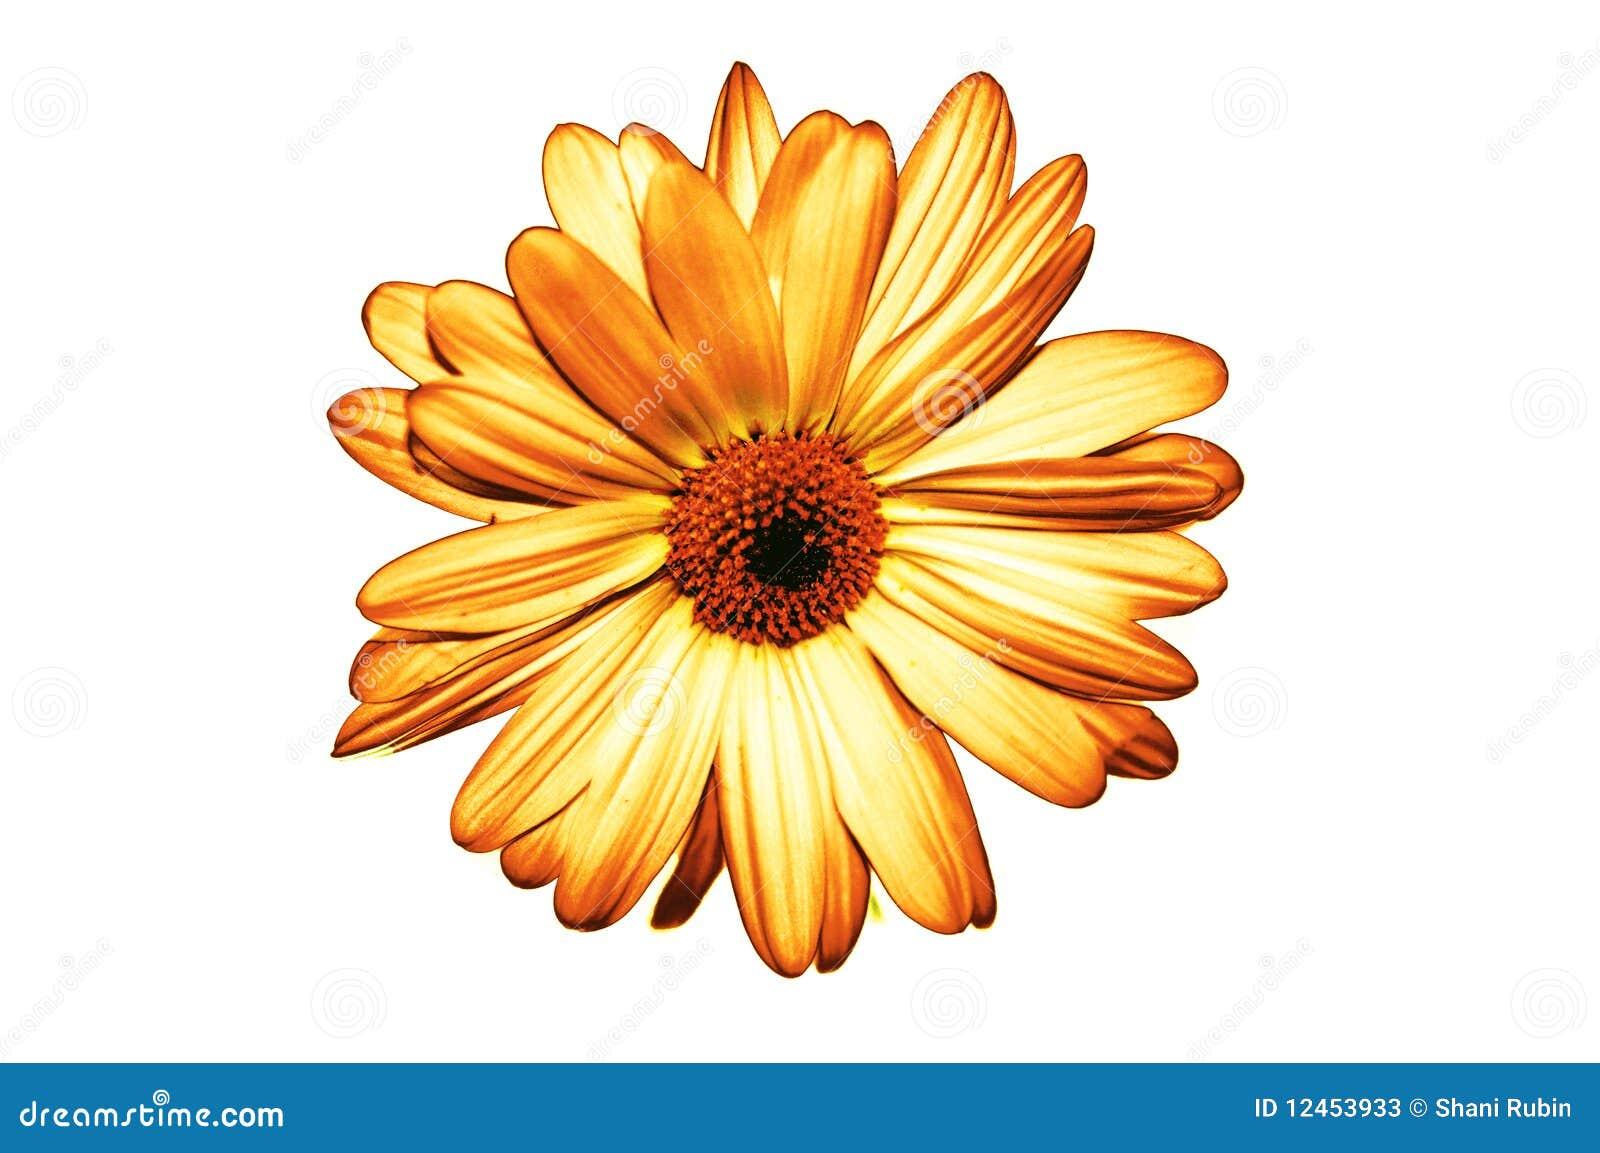 Isolated Yellow Flower On White Background Stock Image Image Of